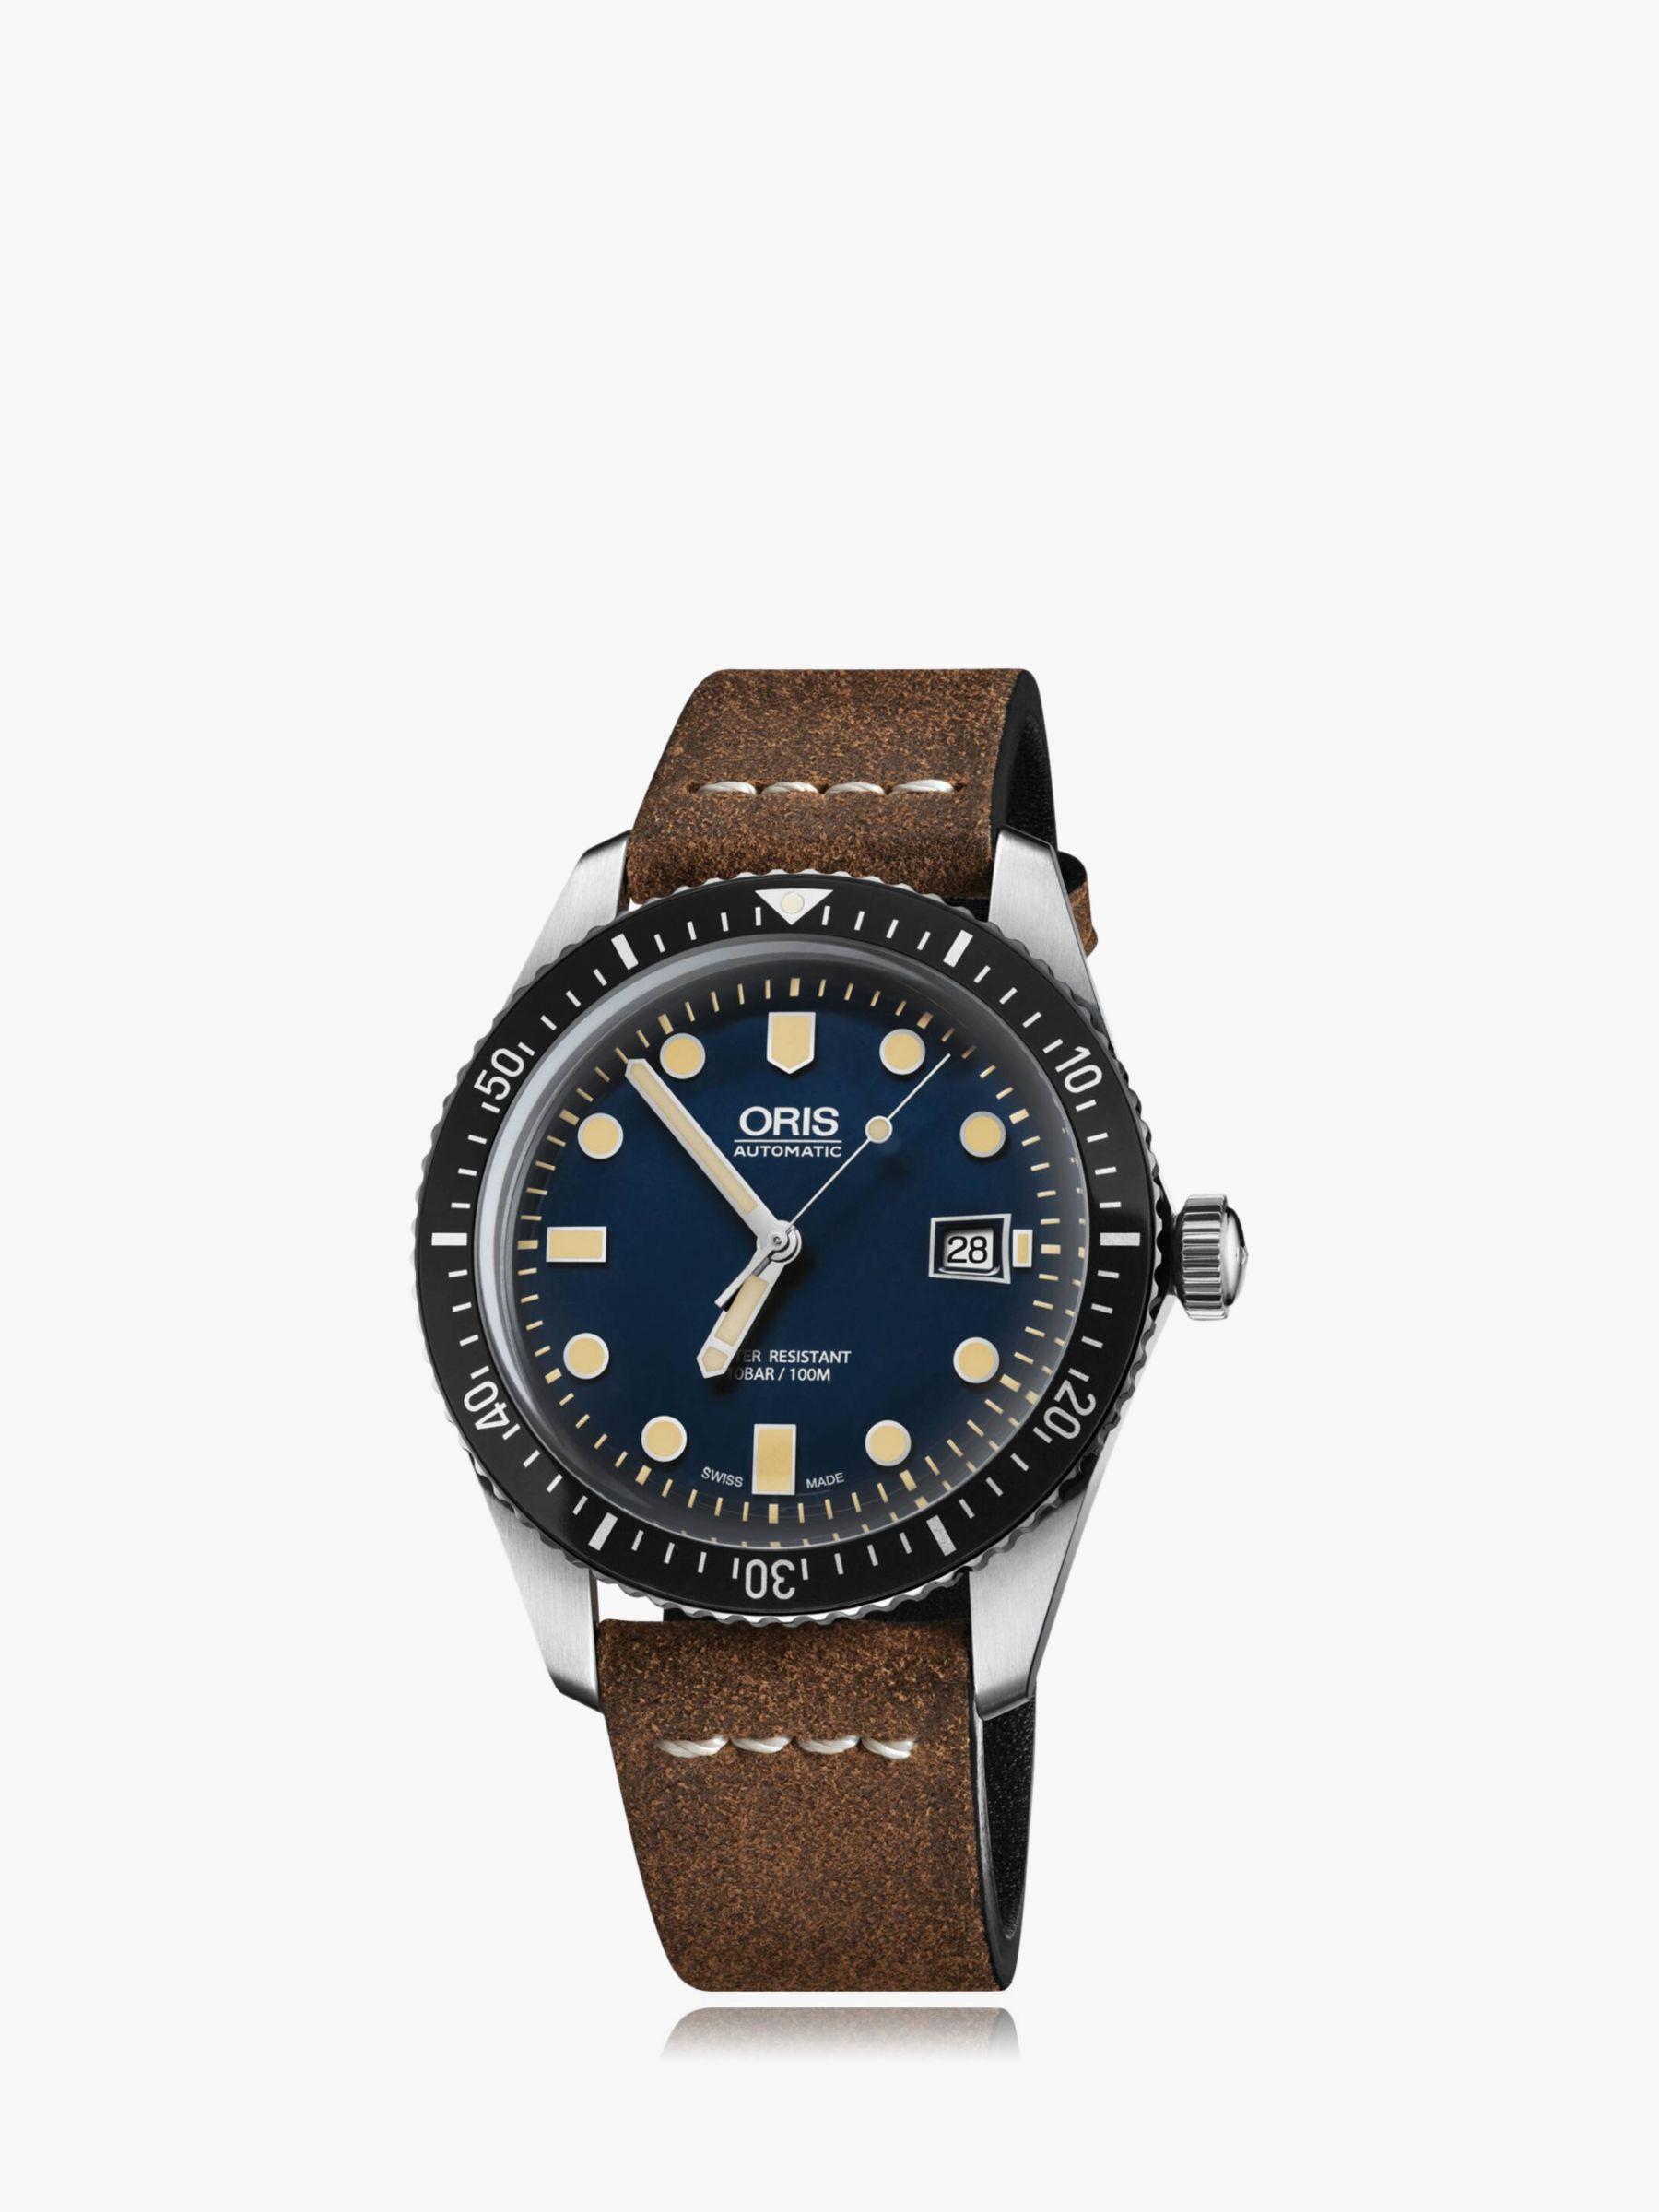 Oris Oris 733 7720 4055-07 5 21 02 Men's Artelier Automatic Date Fabric Strap Watch, Brown/Navy